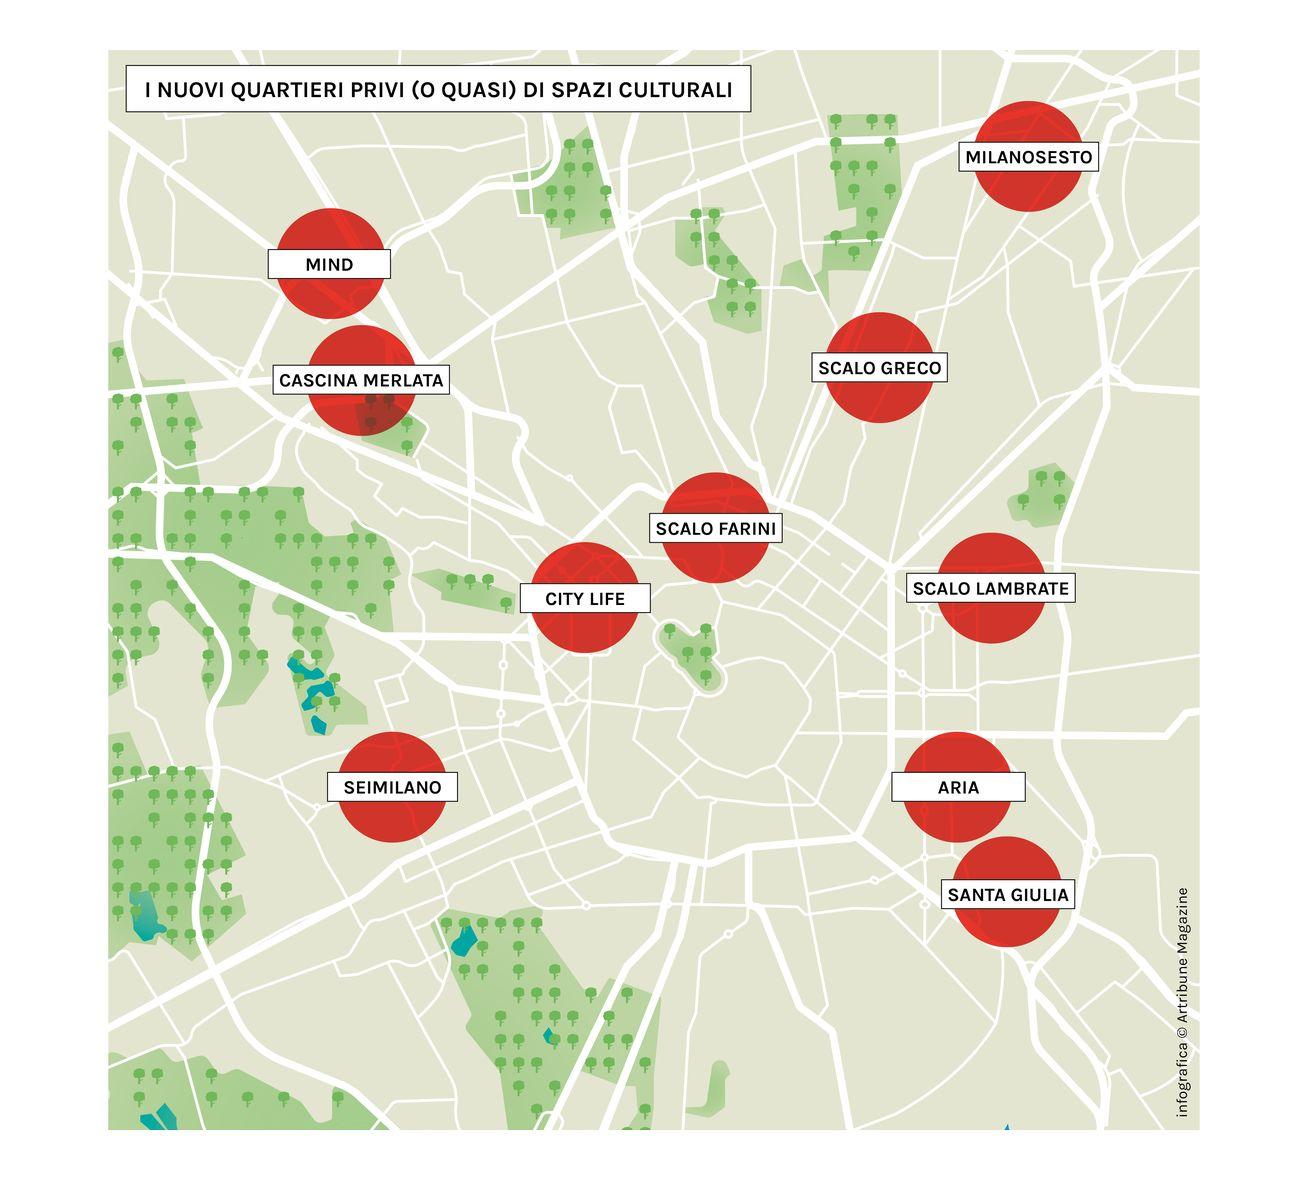 I nuovi quartieri di Milano (quasi) privi di spazi culturali © Artribune Magazine